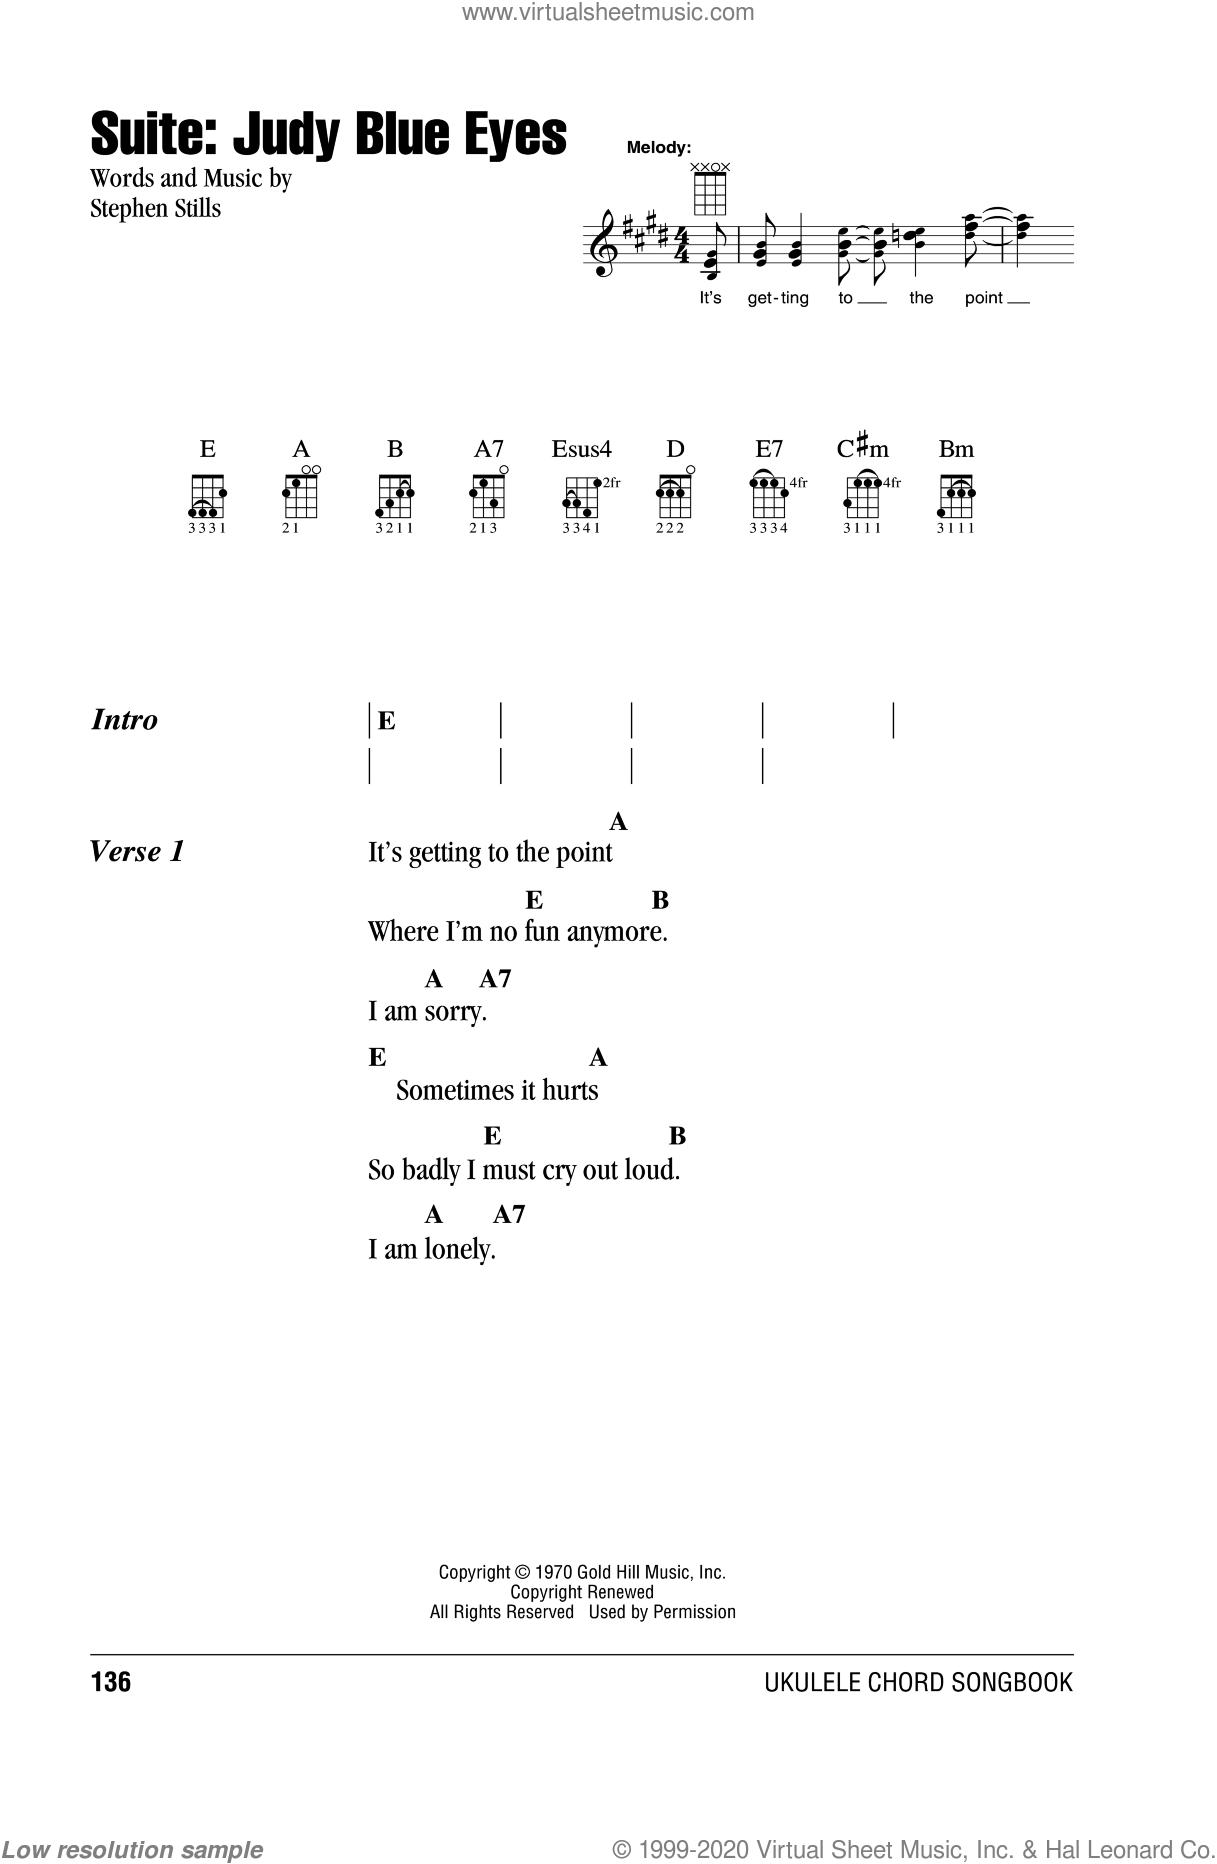 Suite: Judy Blue Eyes sheet music for ukulele (chords) by Crosby, Stills & Nash and Stephen Stills, intermediate skill level